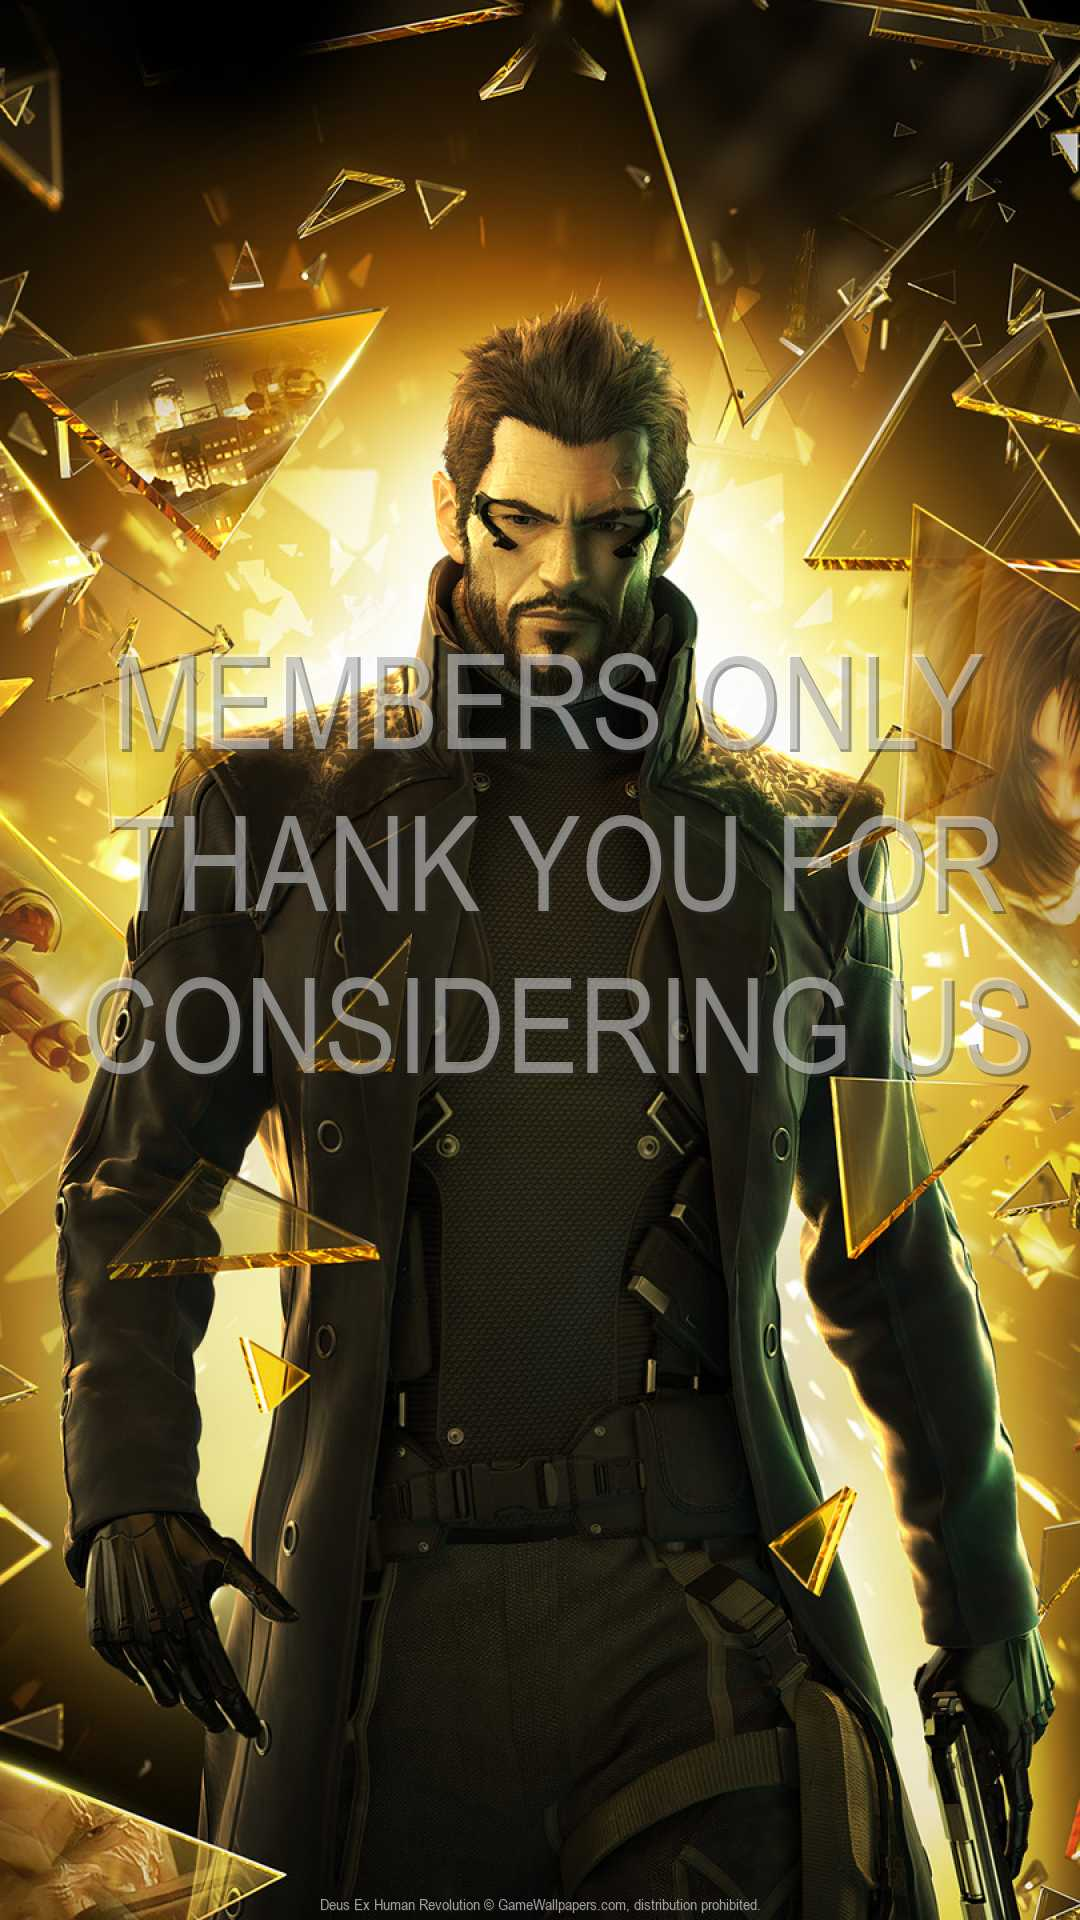 Deus Ex: Human Revolution 1080p Vertical Móvil fondo de escritorio 08